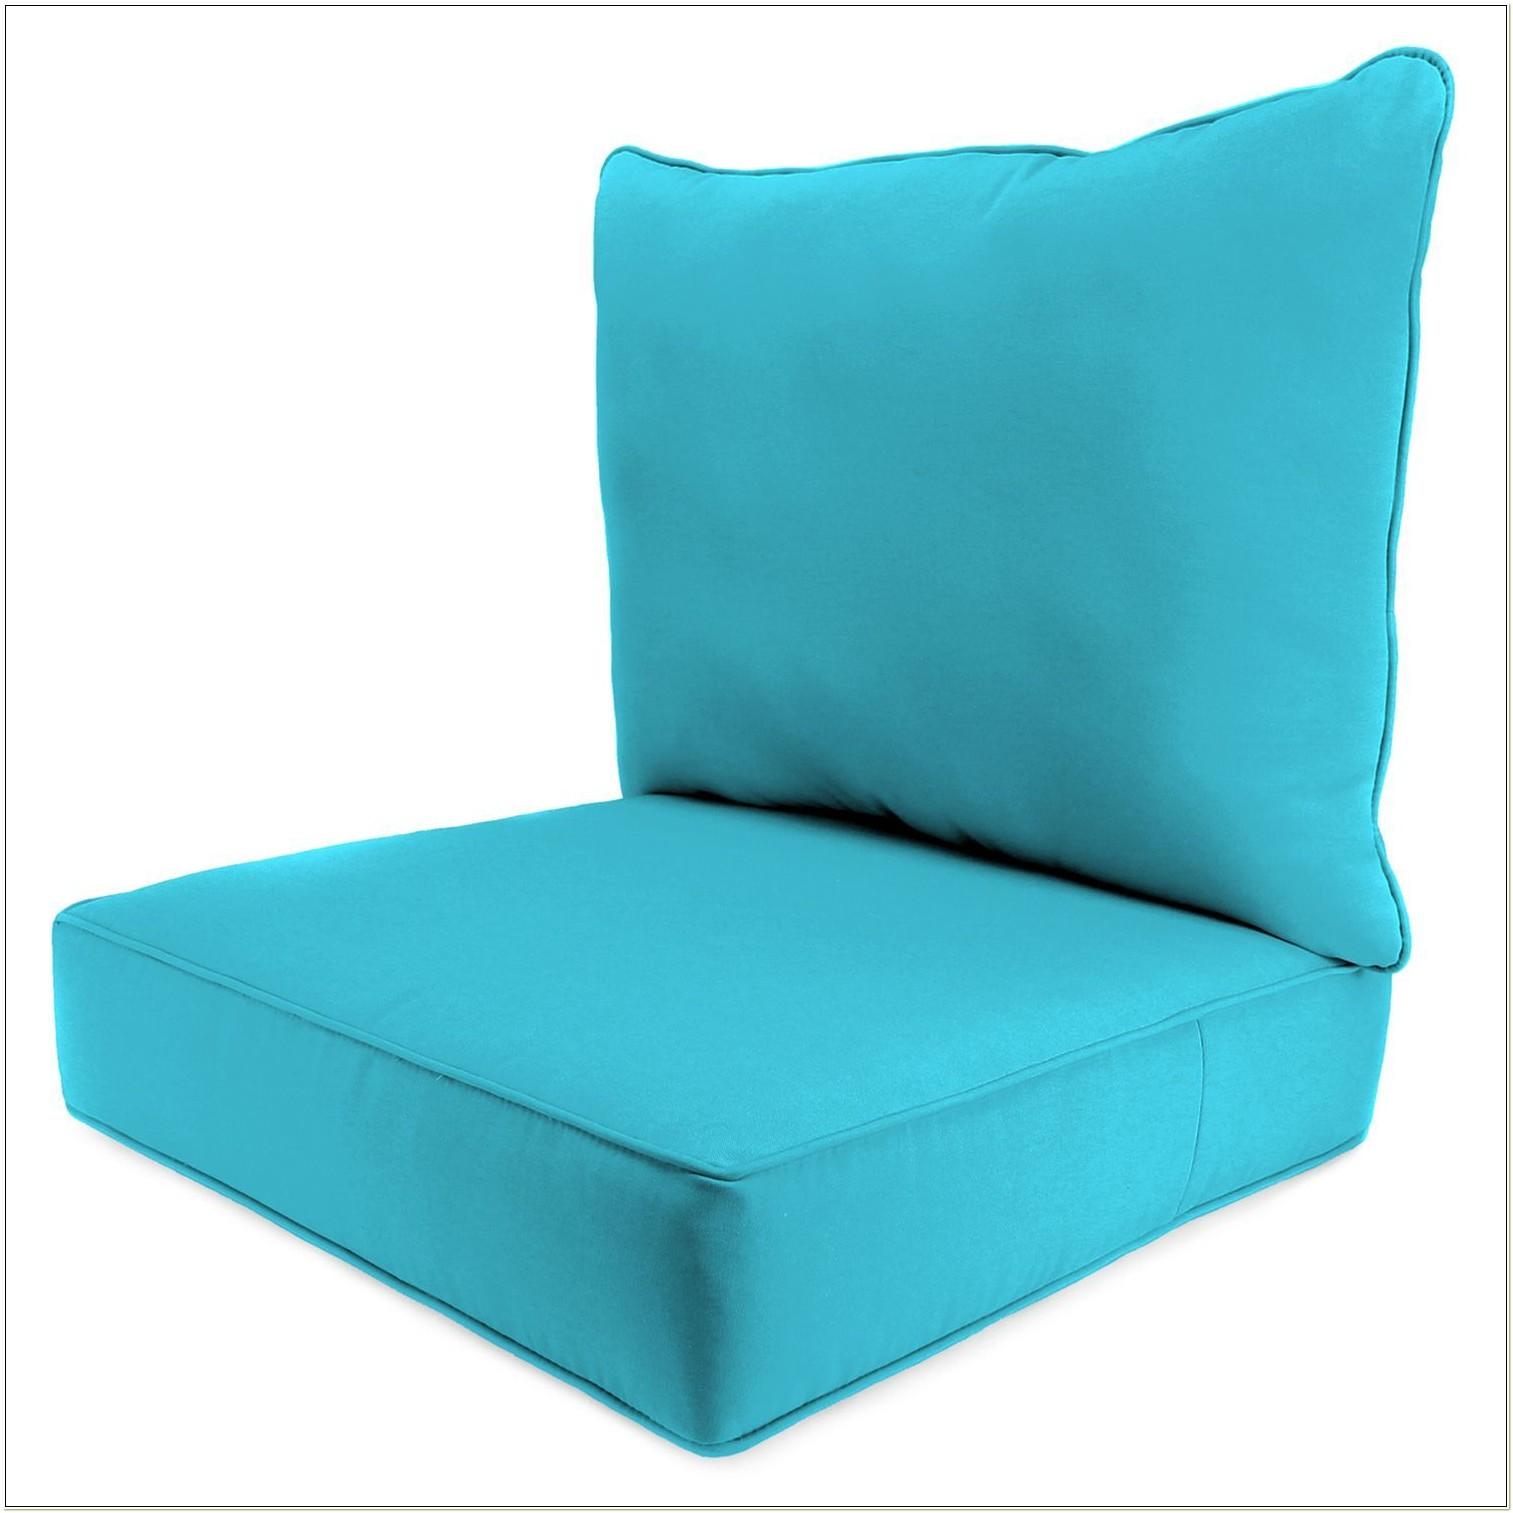 Garden Bench Cushion Covers